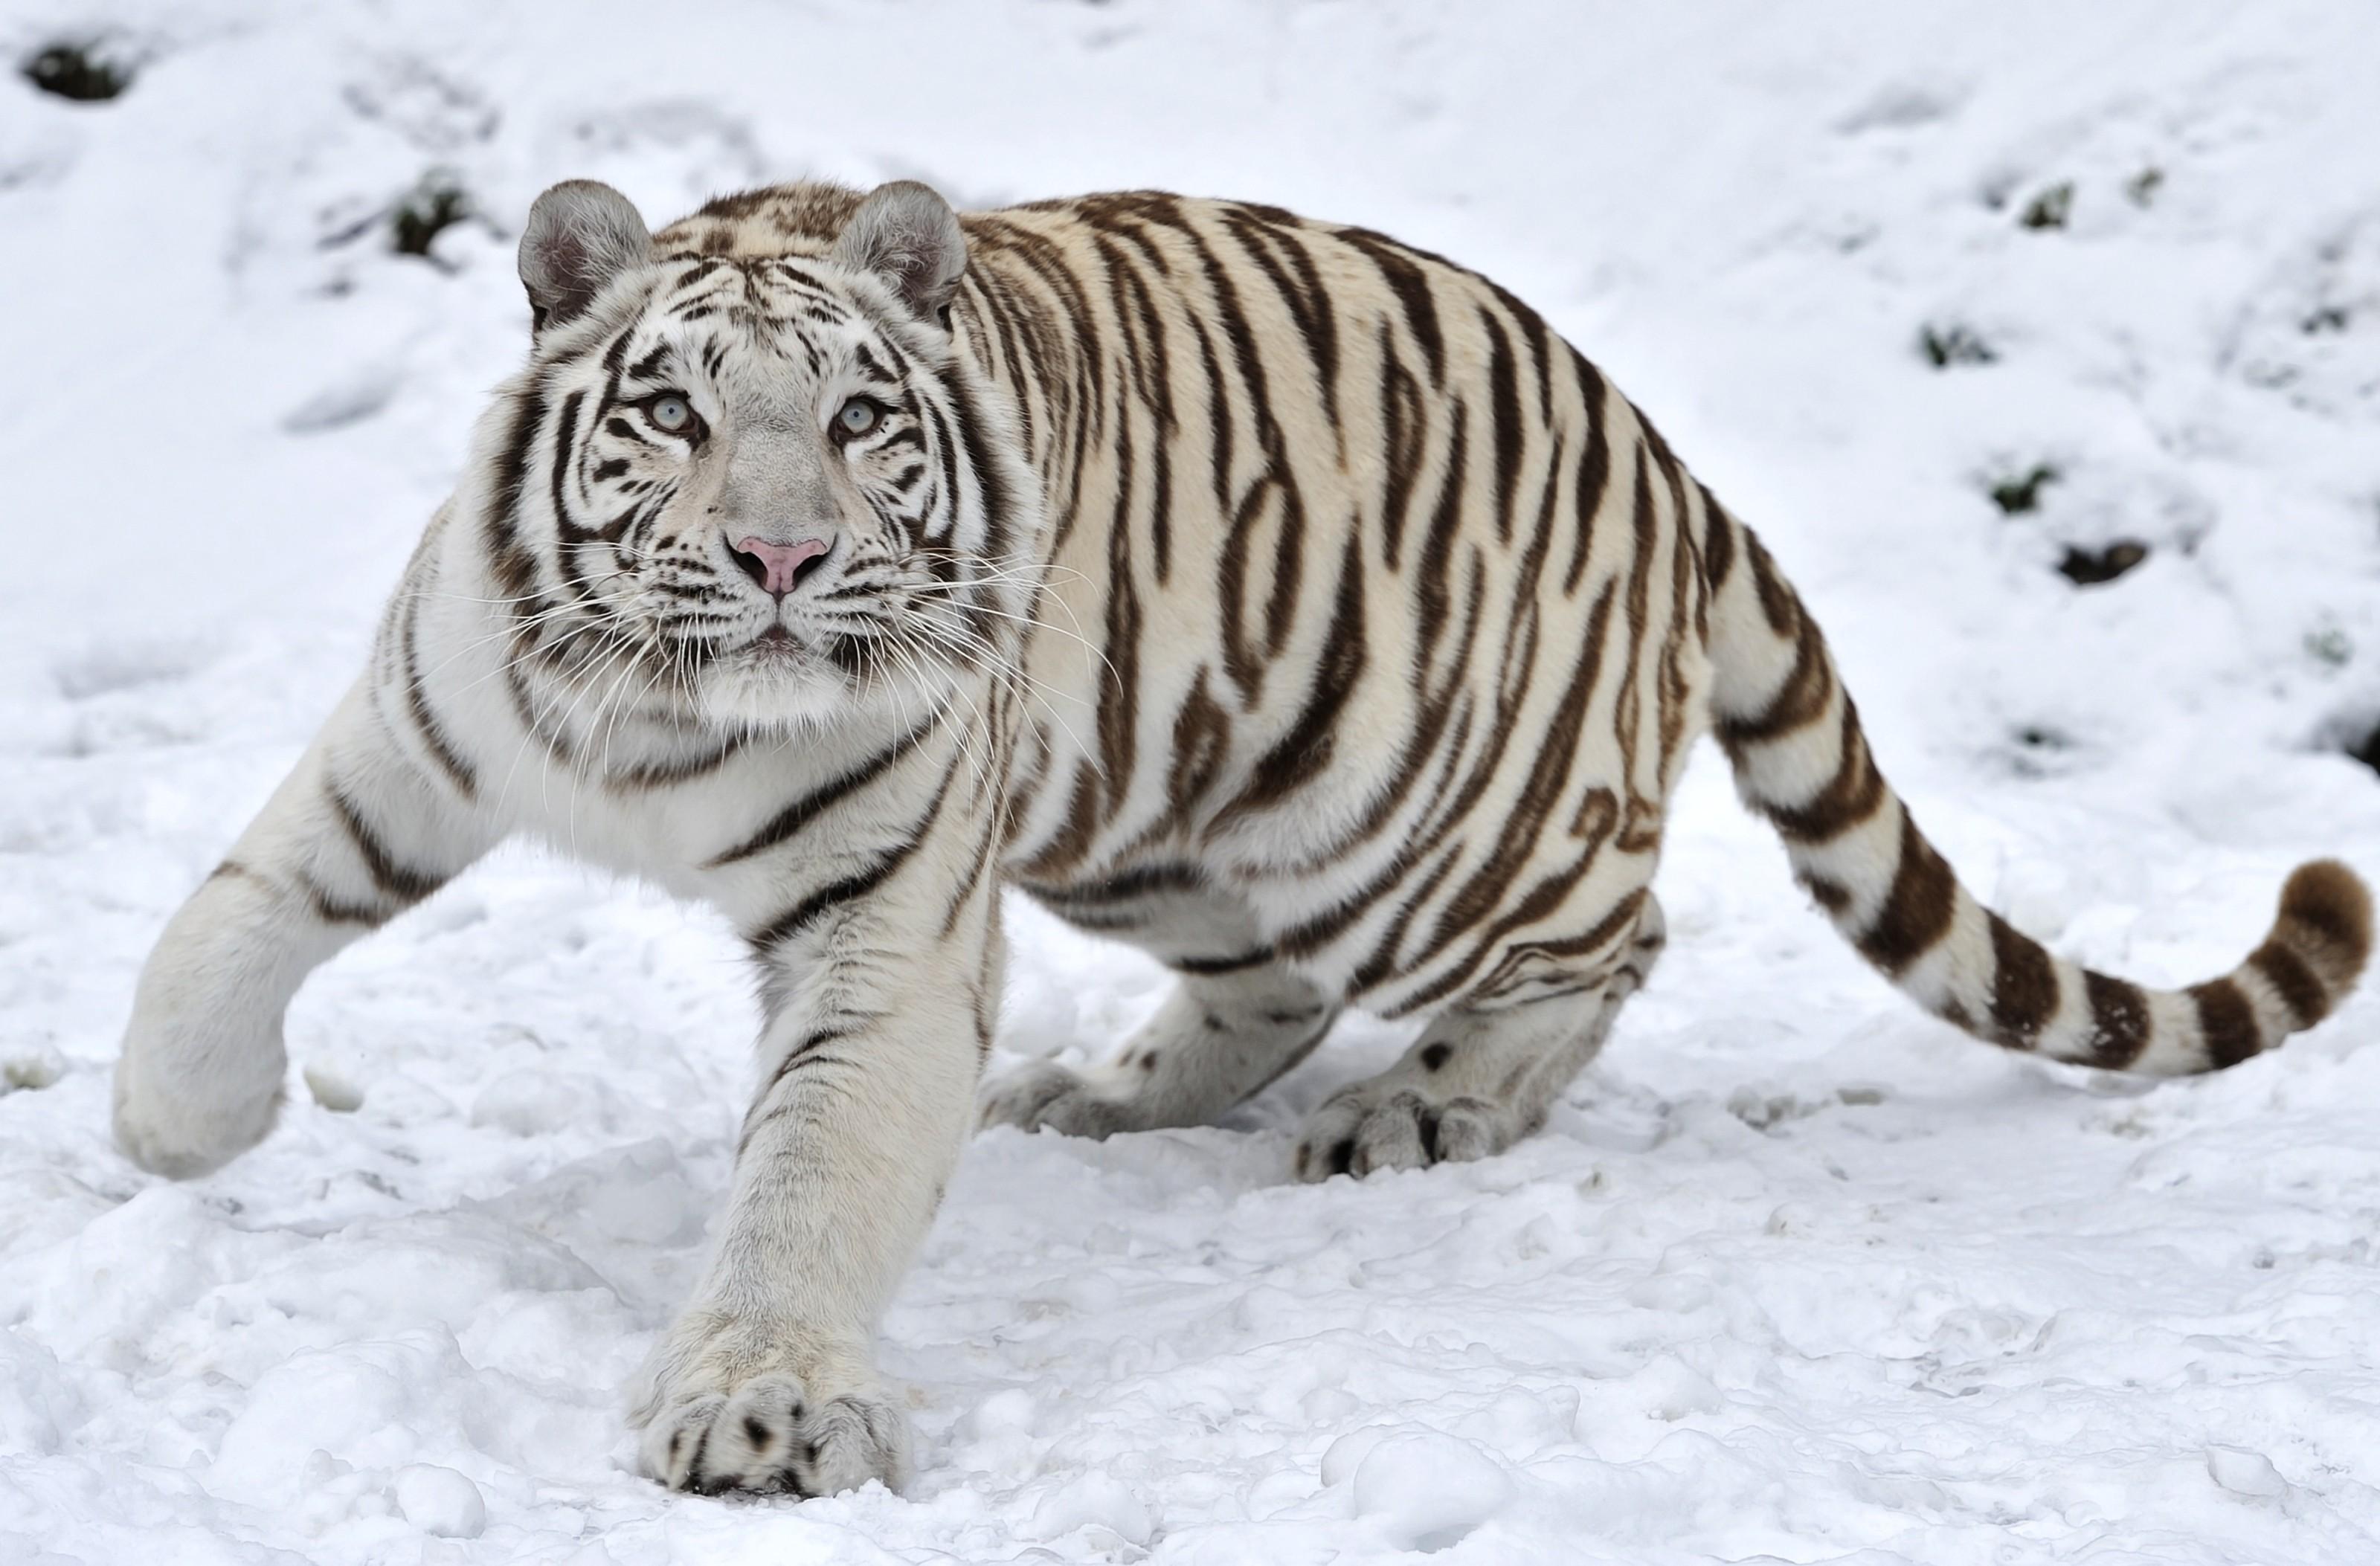 Tigre Blanc Dans La Neige Fond D Ecran Tigre Blanco 3200x2106 Wallpapertip